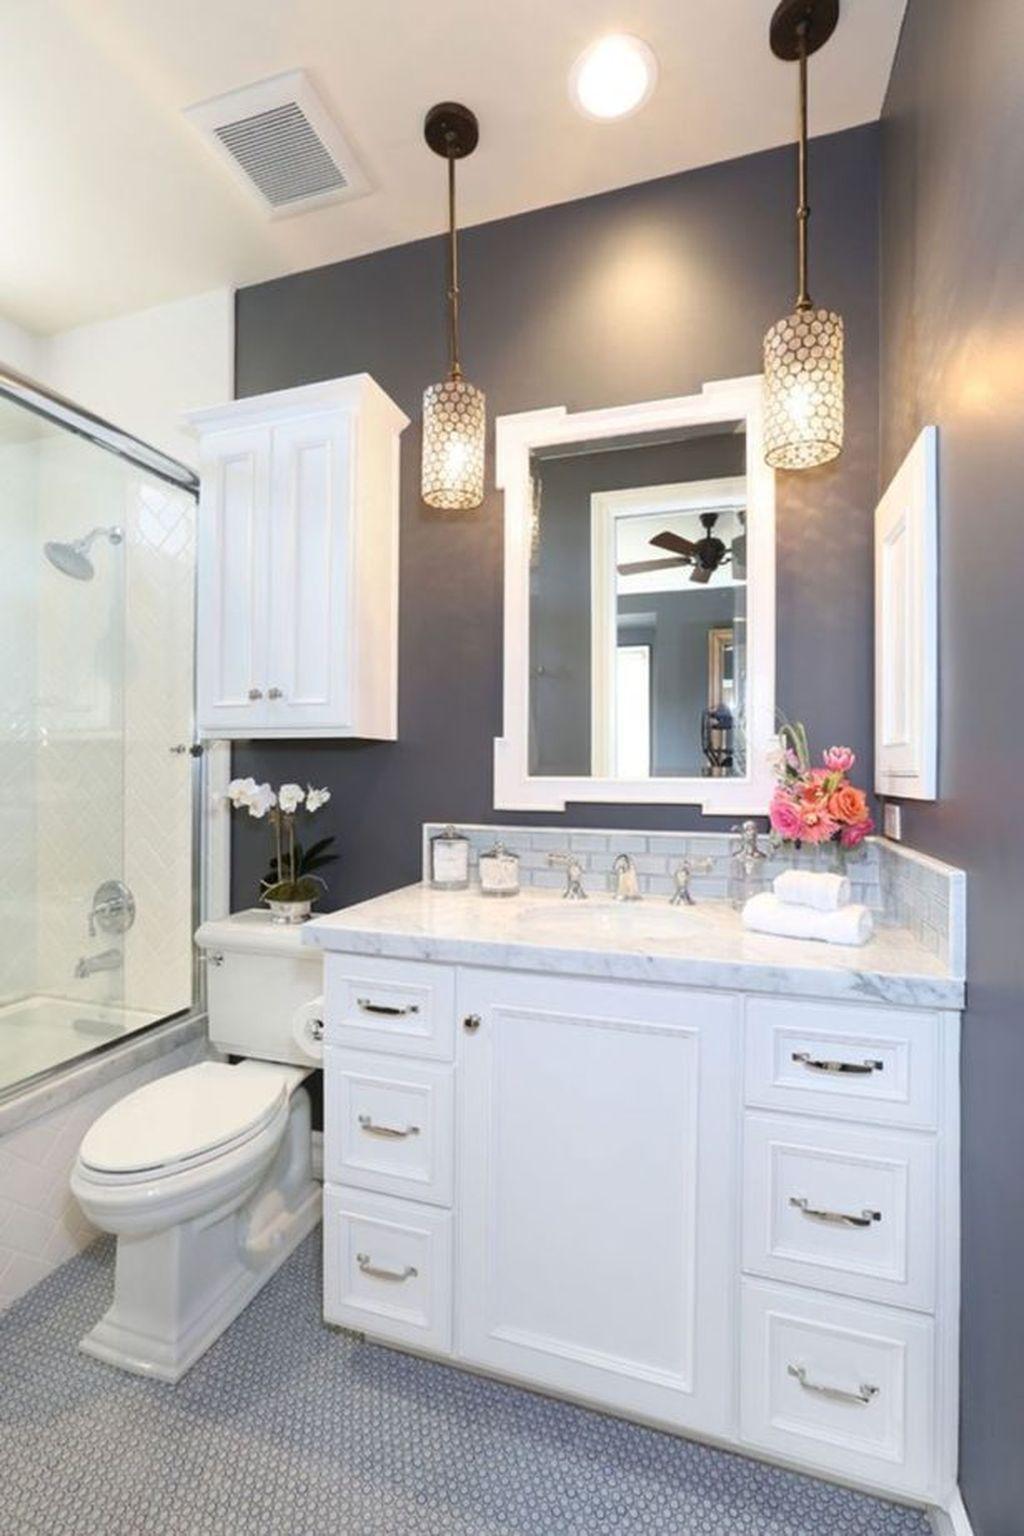 67 Fantastic Minimalist White Bathroom Remodel Ideas | White ...